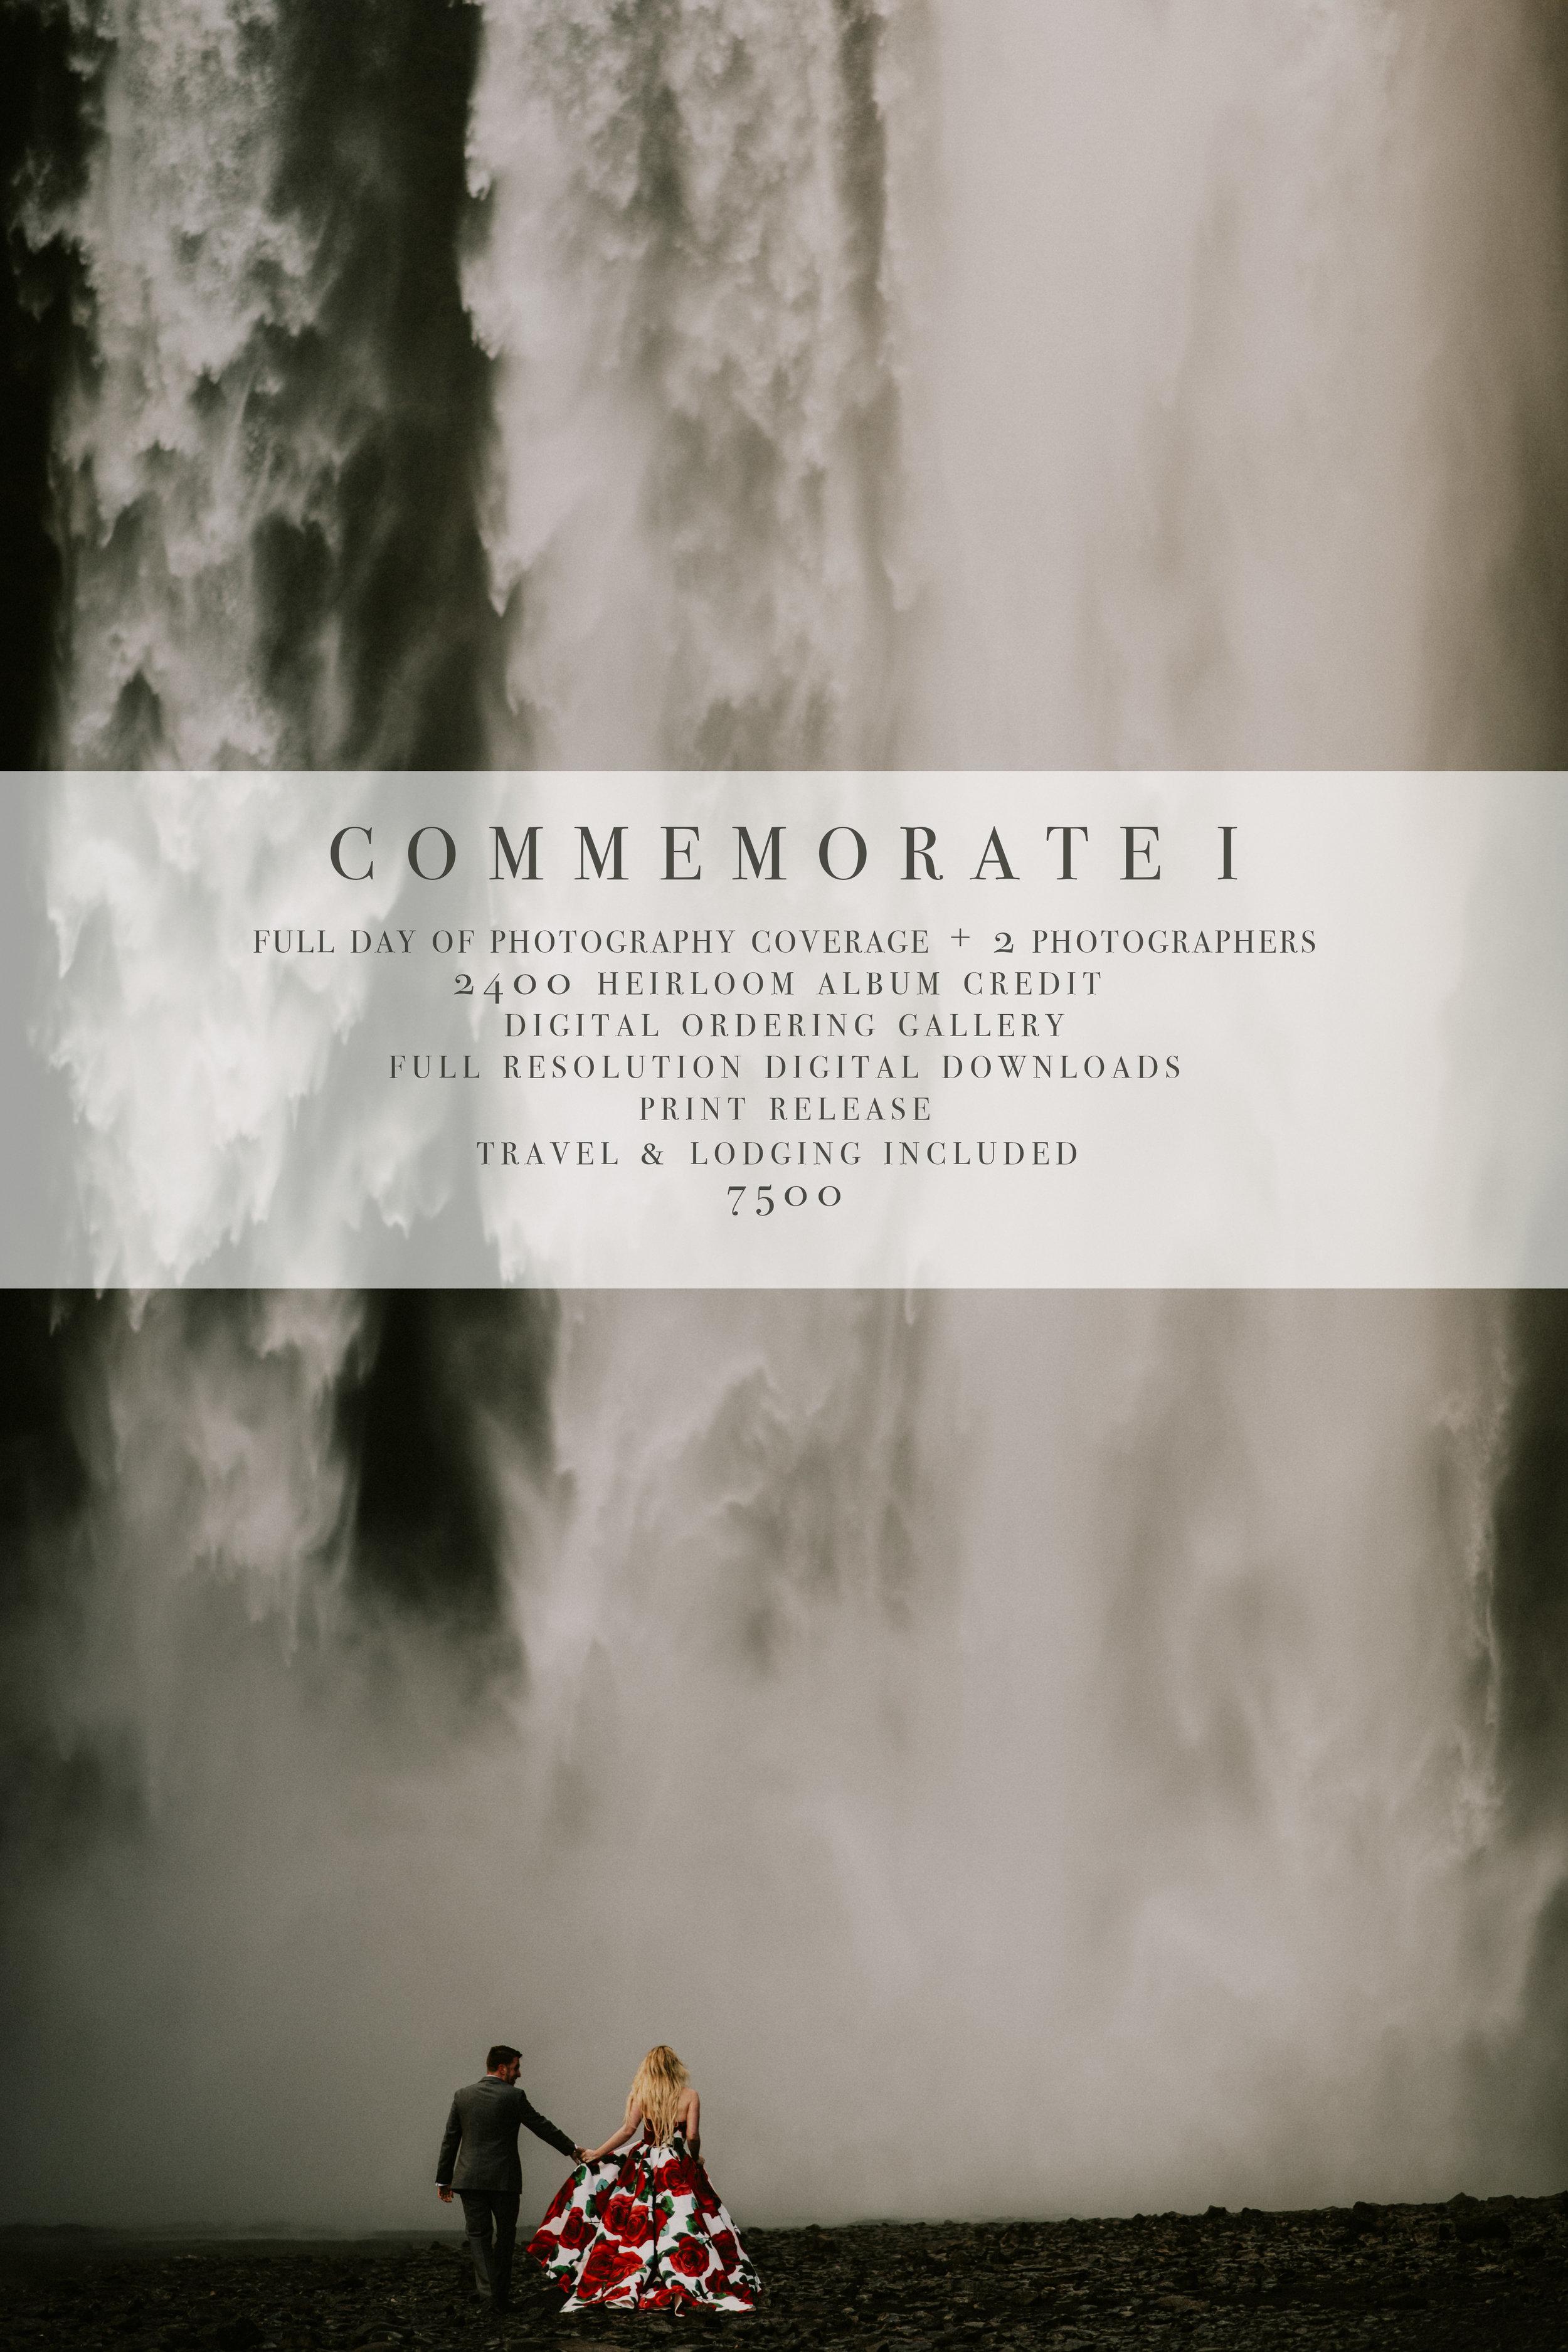 commemorate1_1.jpg